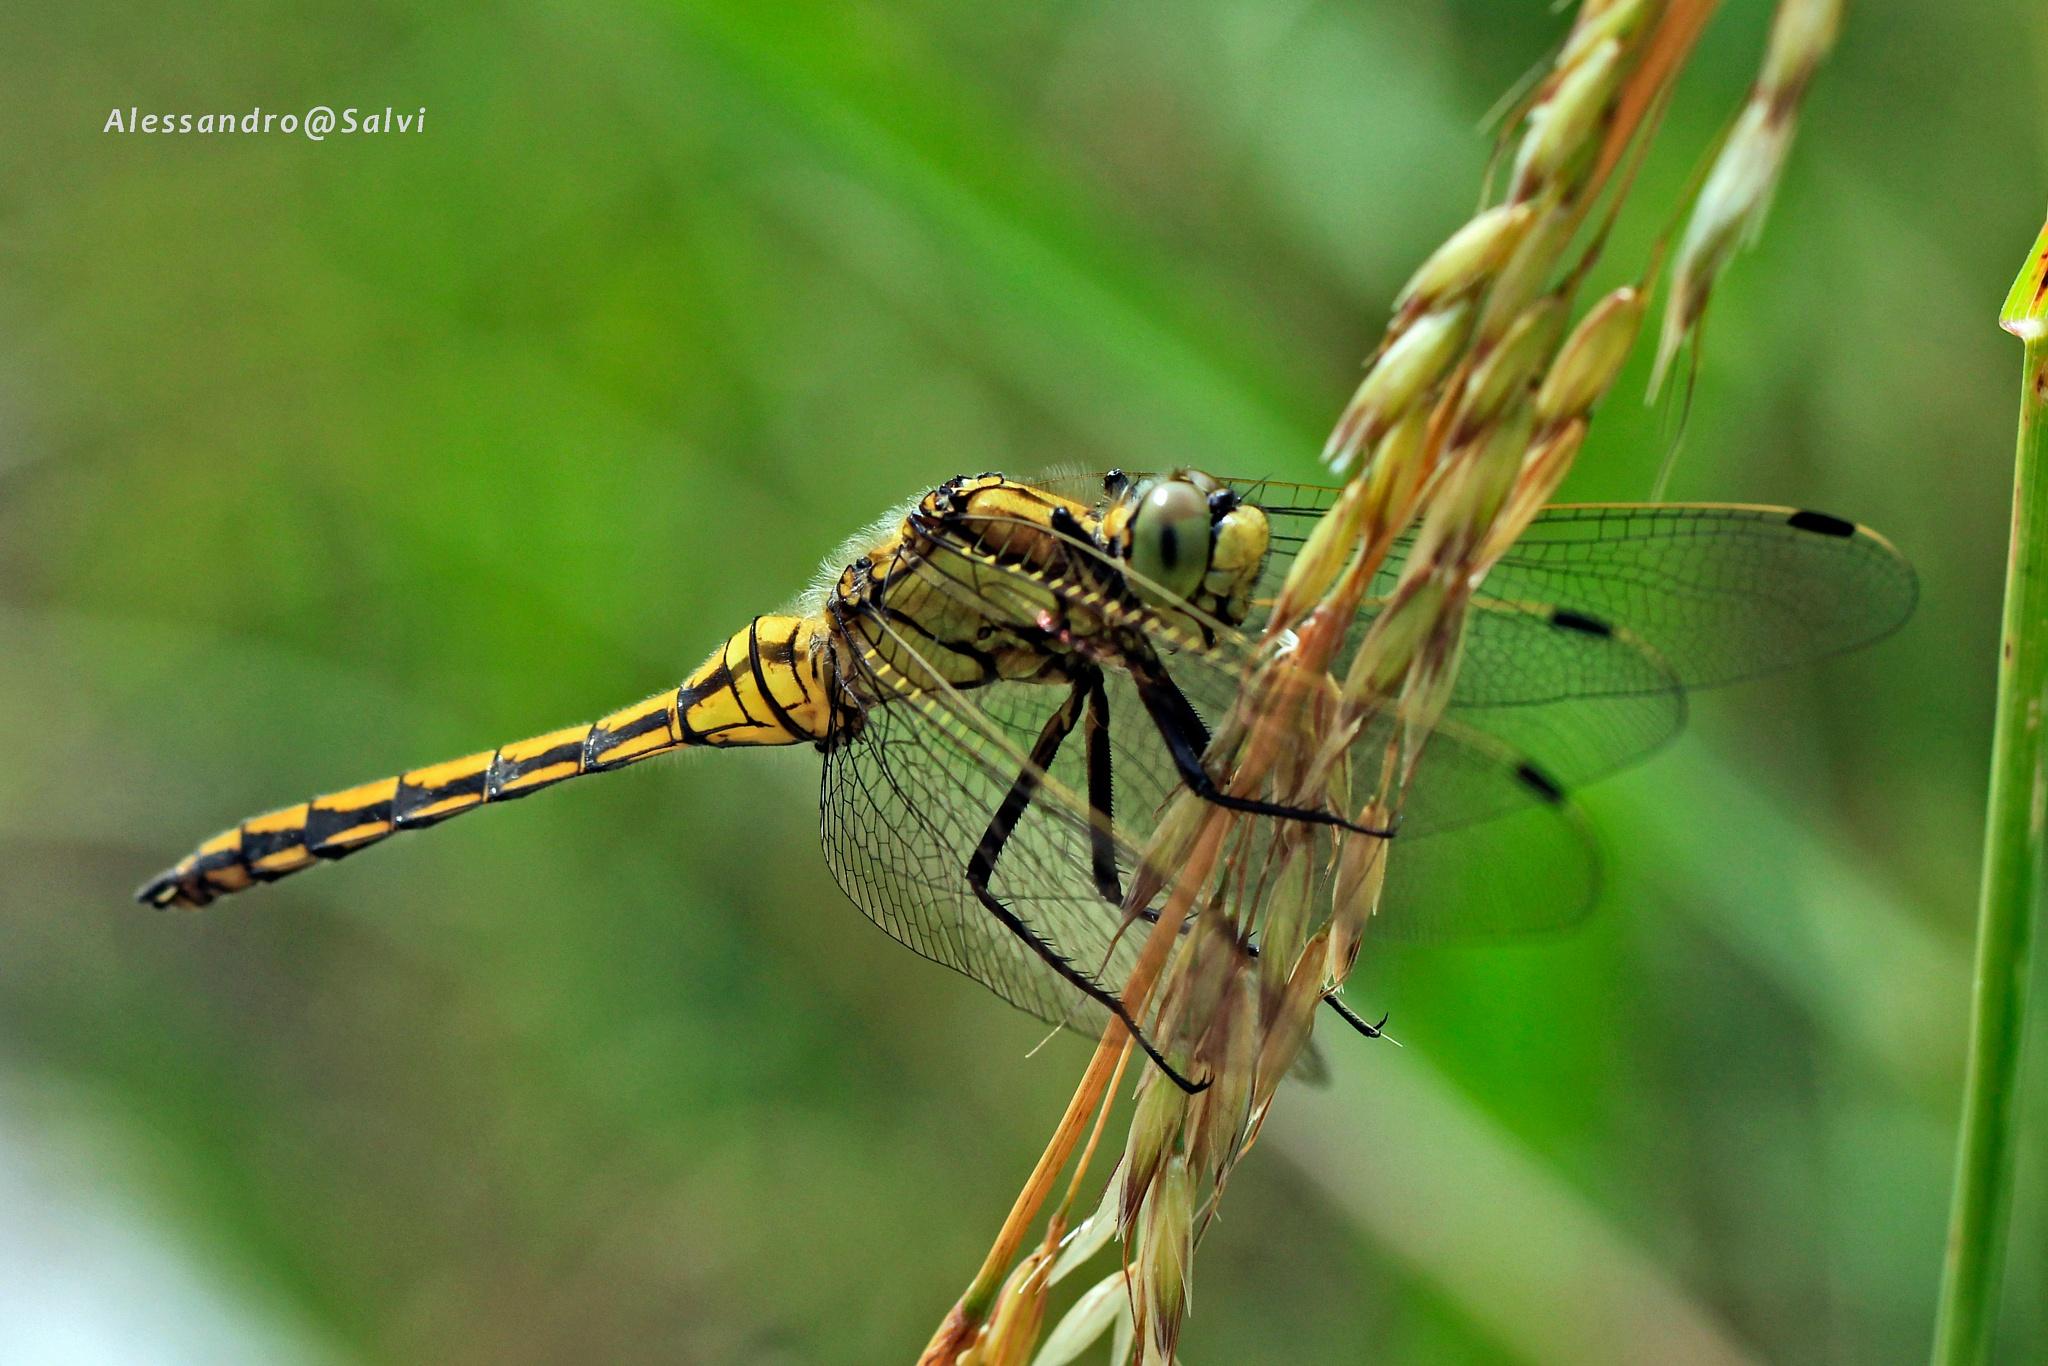 dragonfly 3 by Alessandro Salvi